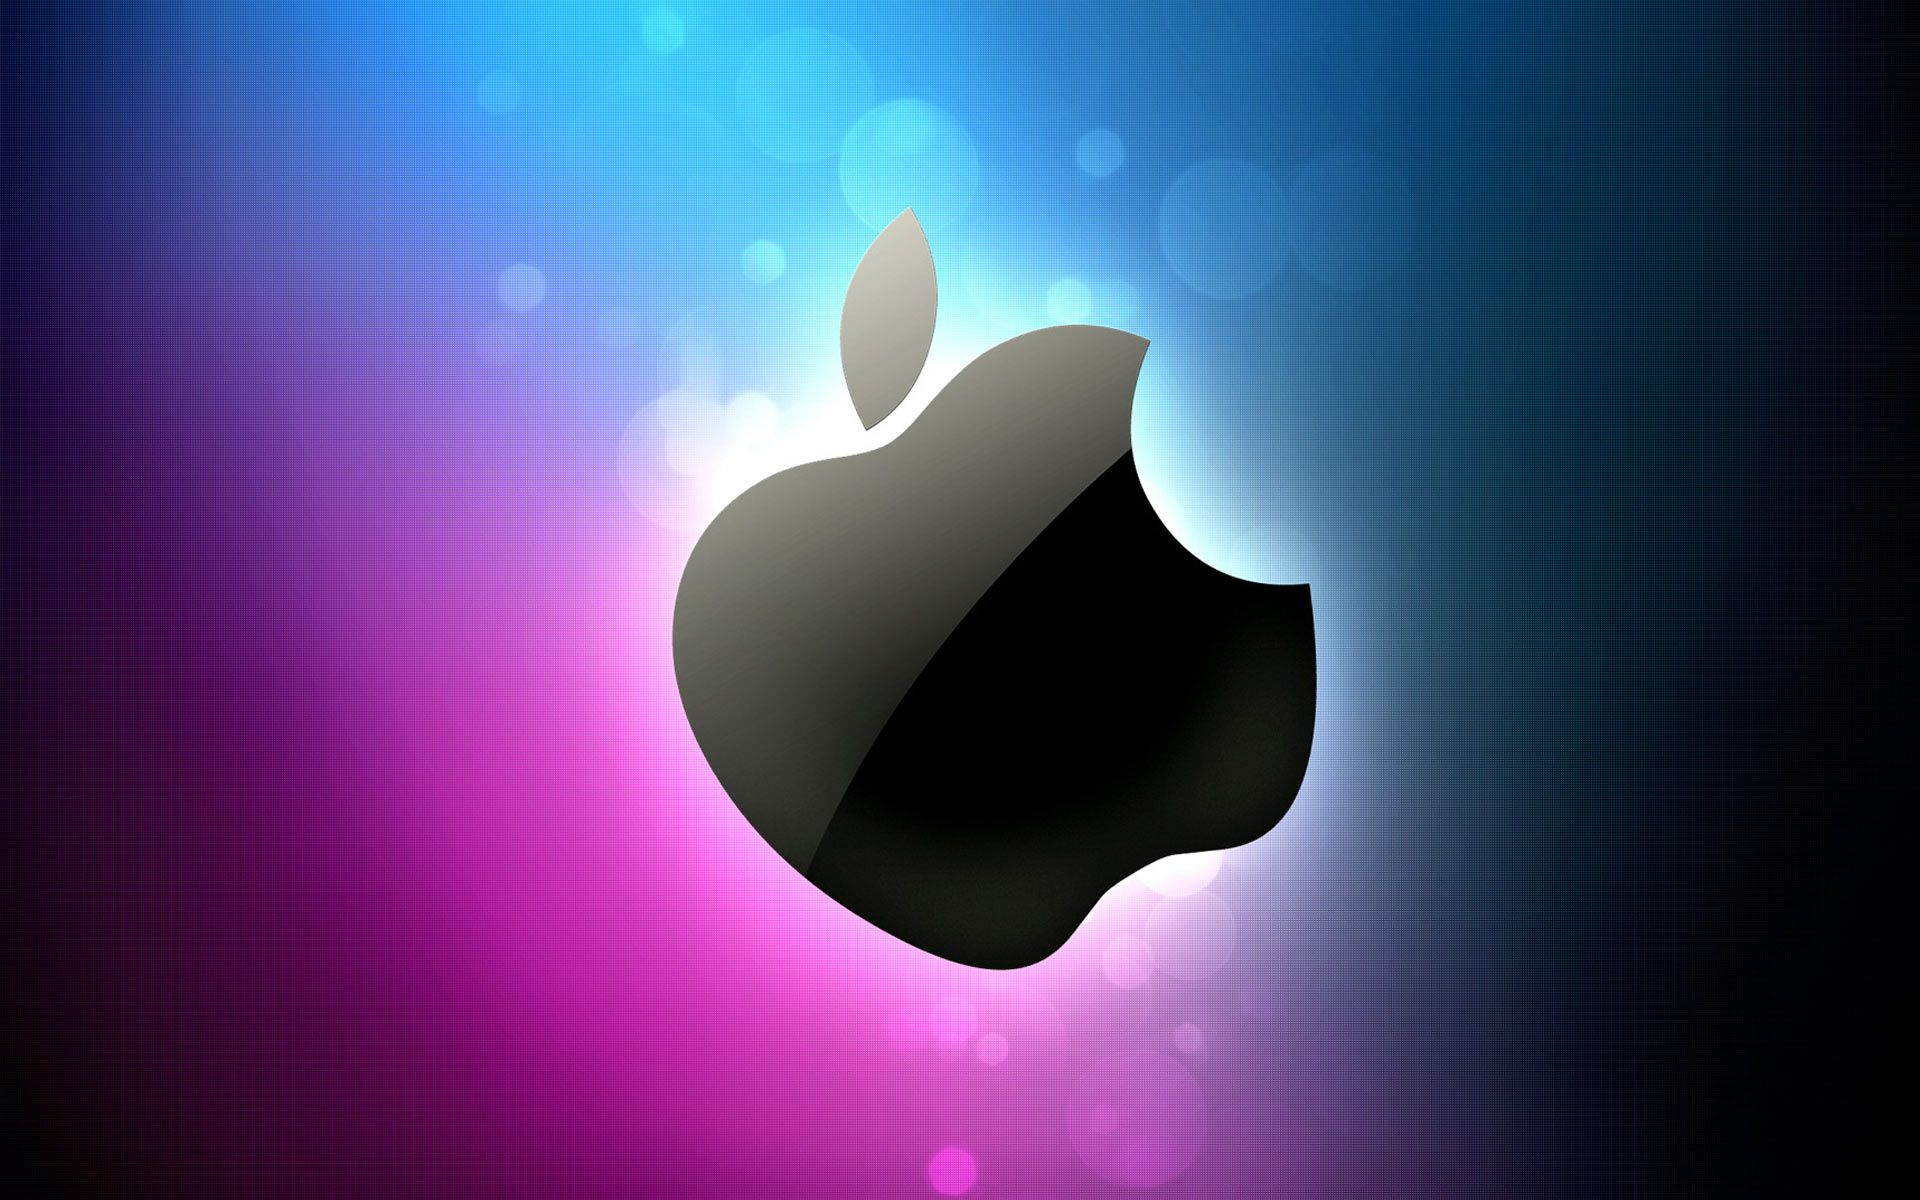 Computer Vista Background Apple picture nr 47833 1920x1200